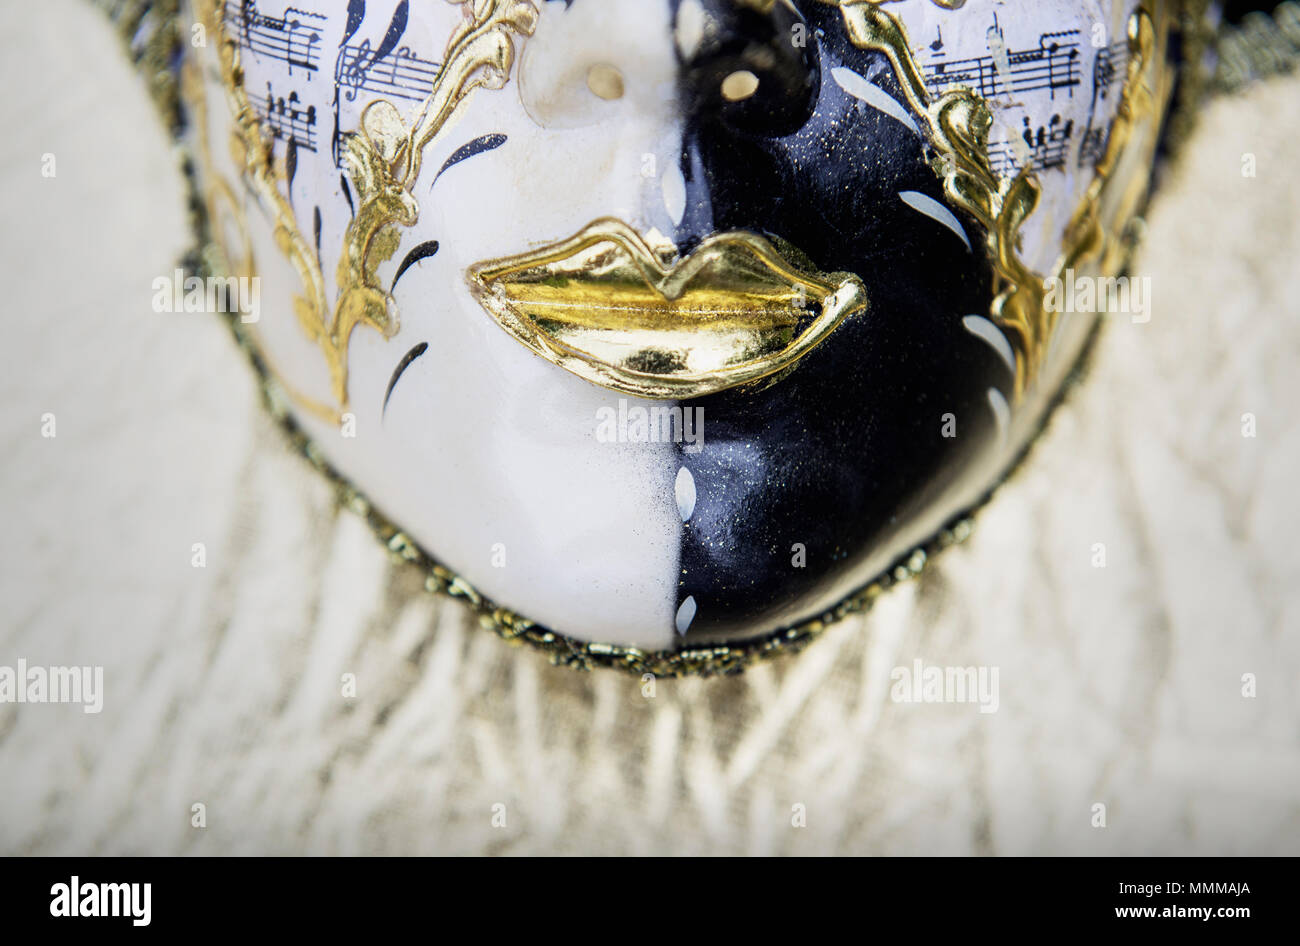 Detail of a Venetian carnival mask - Stock Image